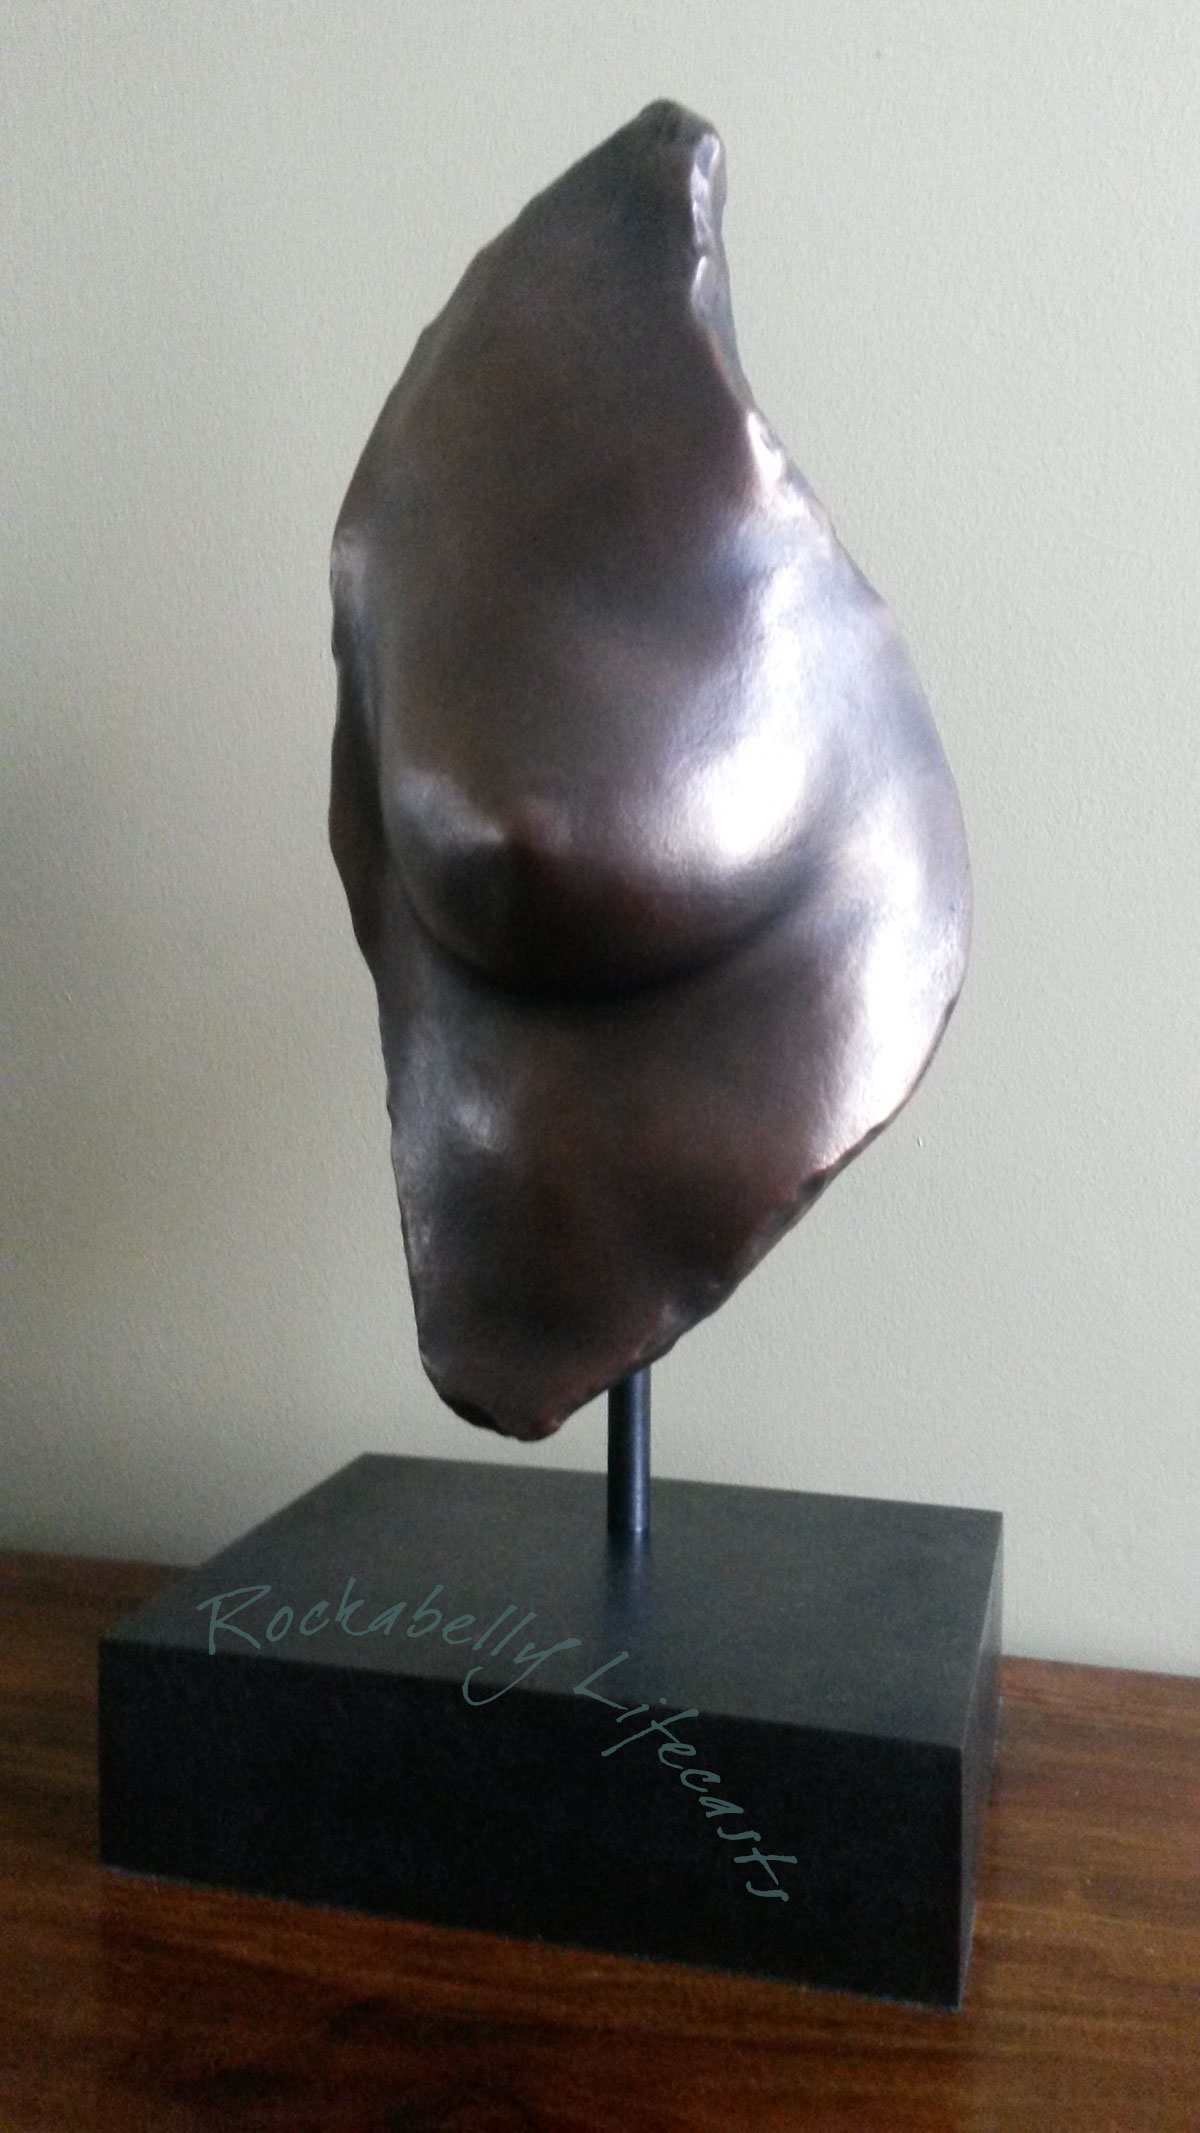 Pre-mastectomy breast cast with copper veneer.